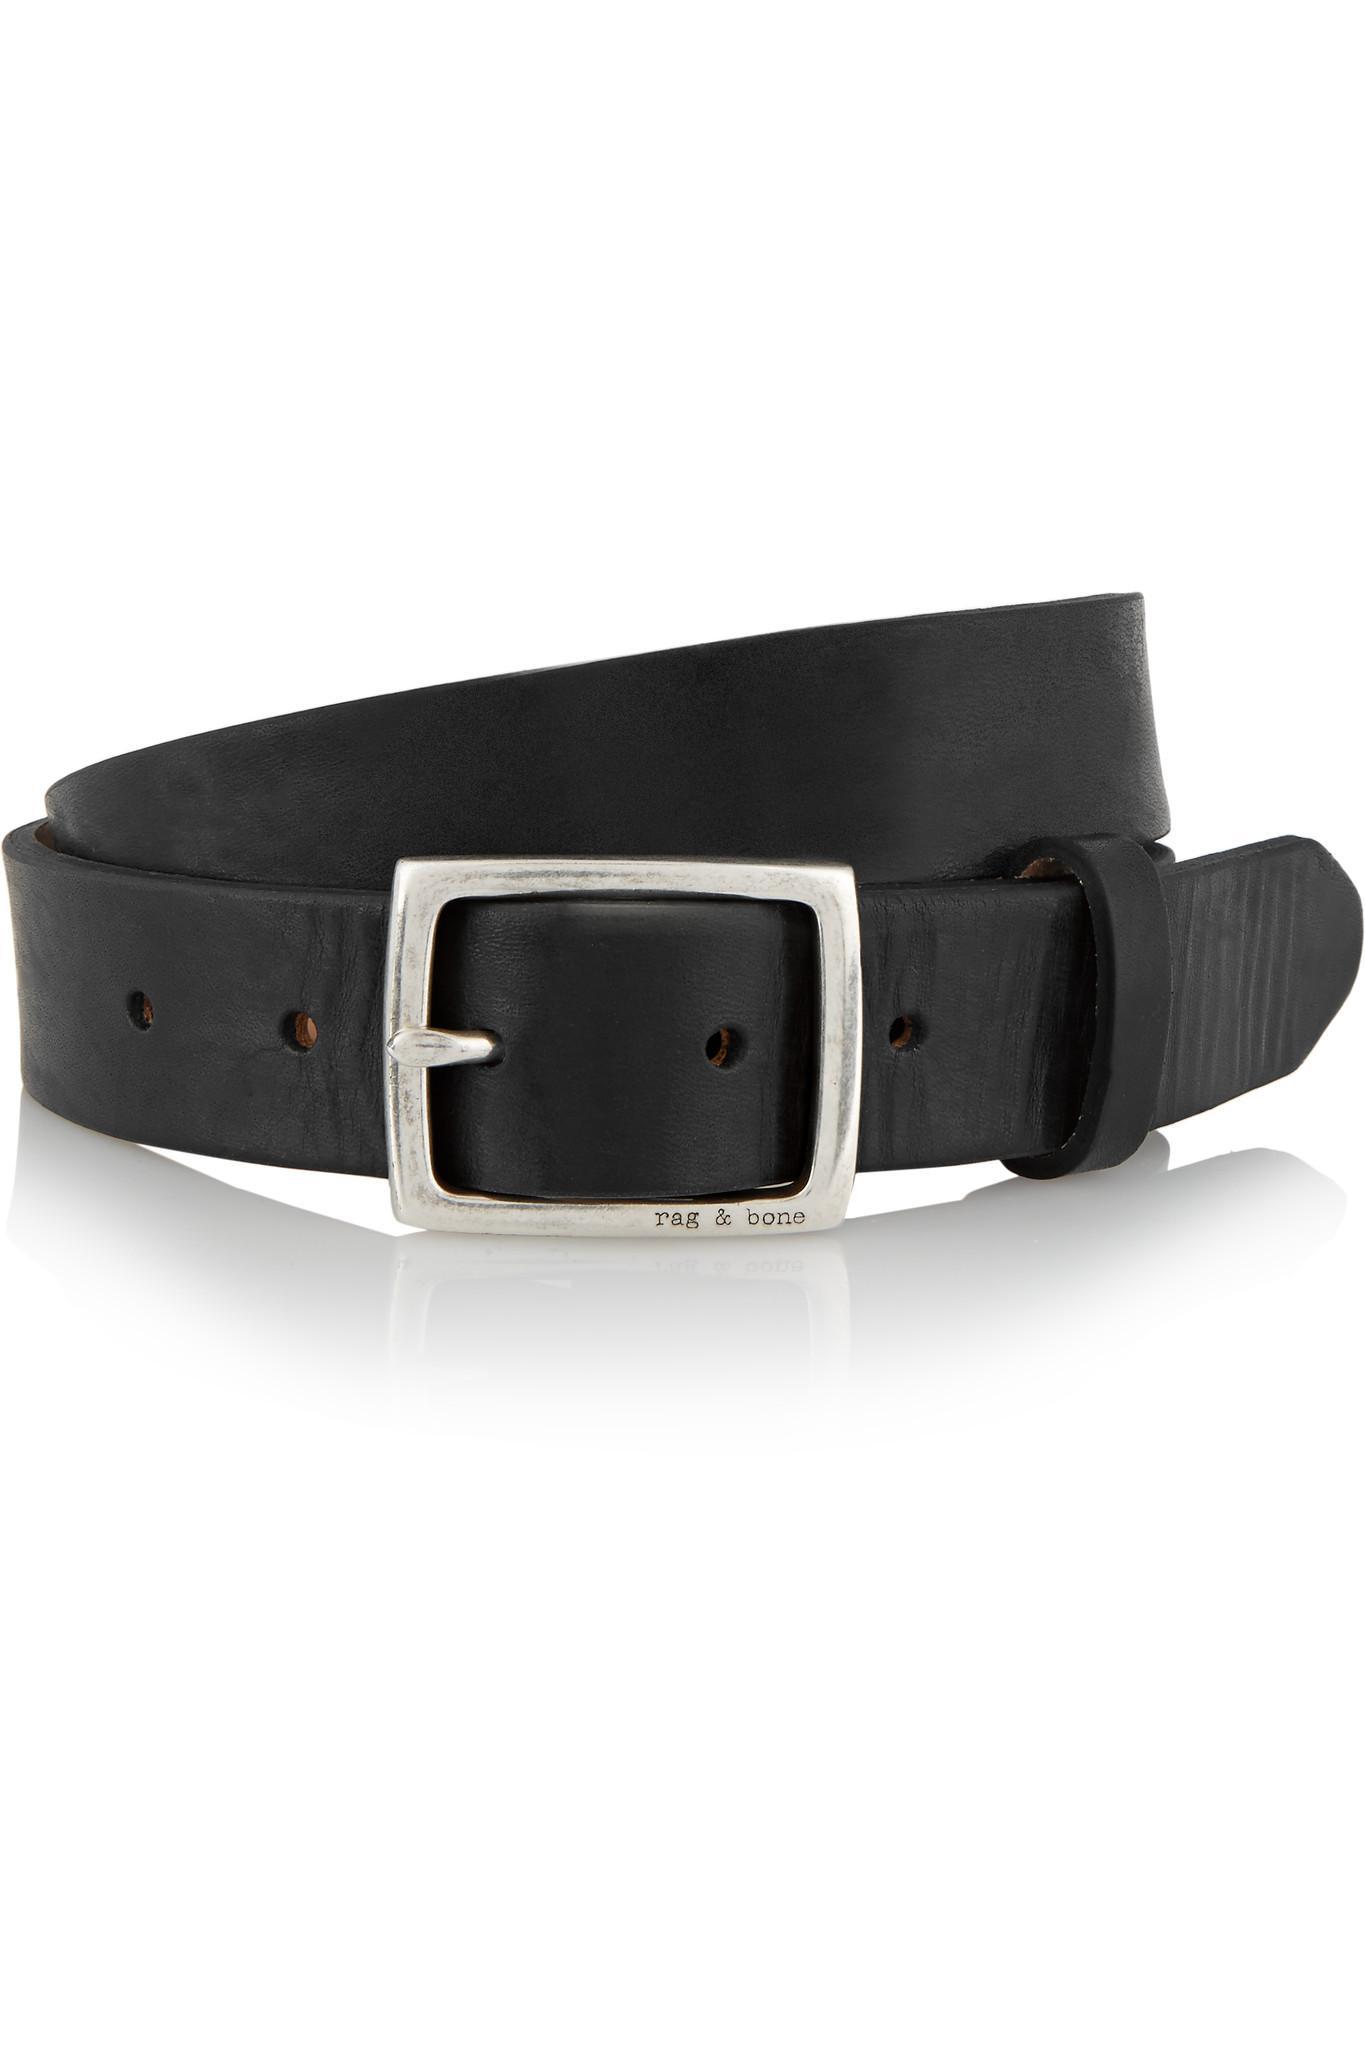 Black Leather Boyfriend Belt Rag & Bone Ew63m3